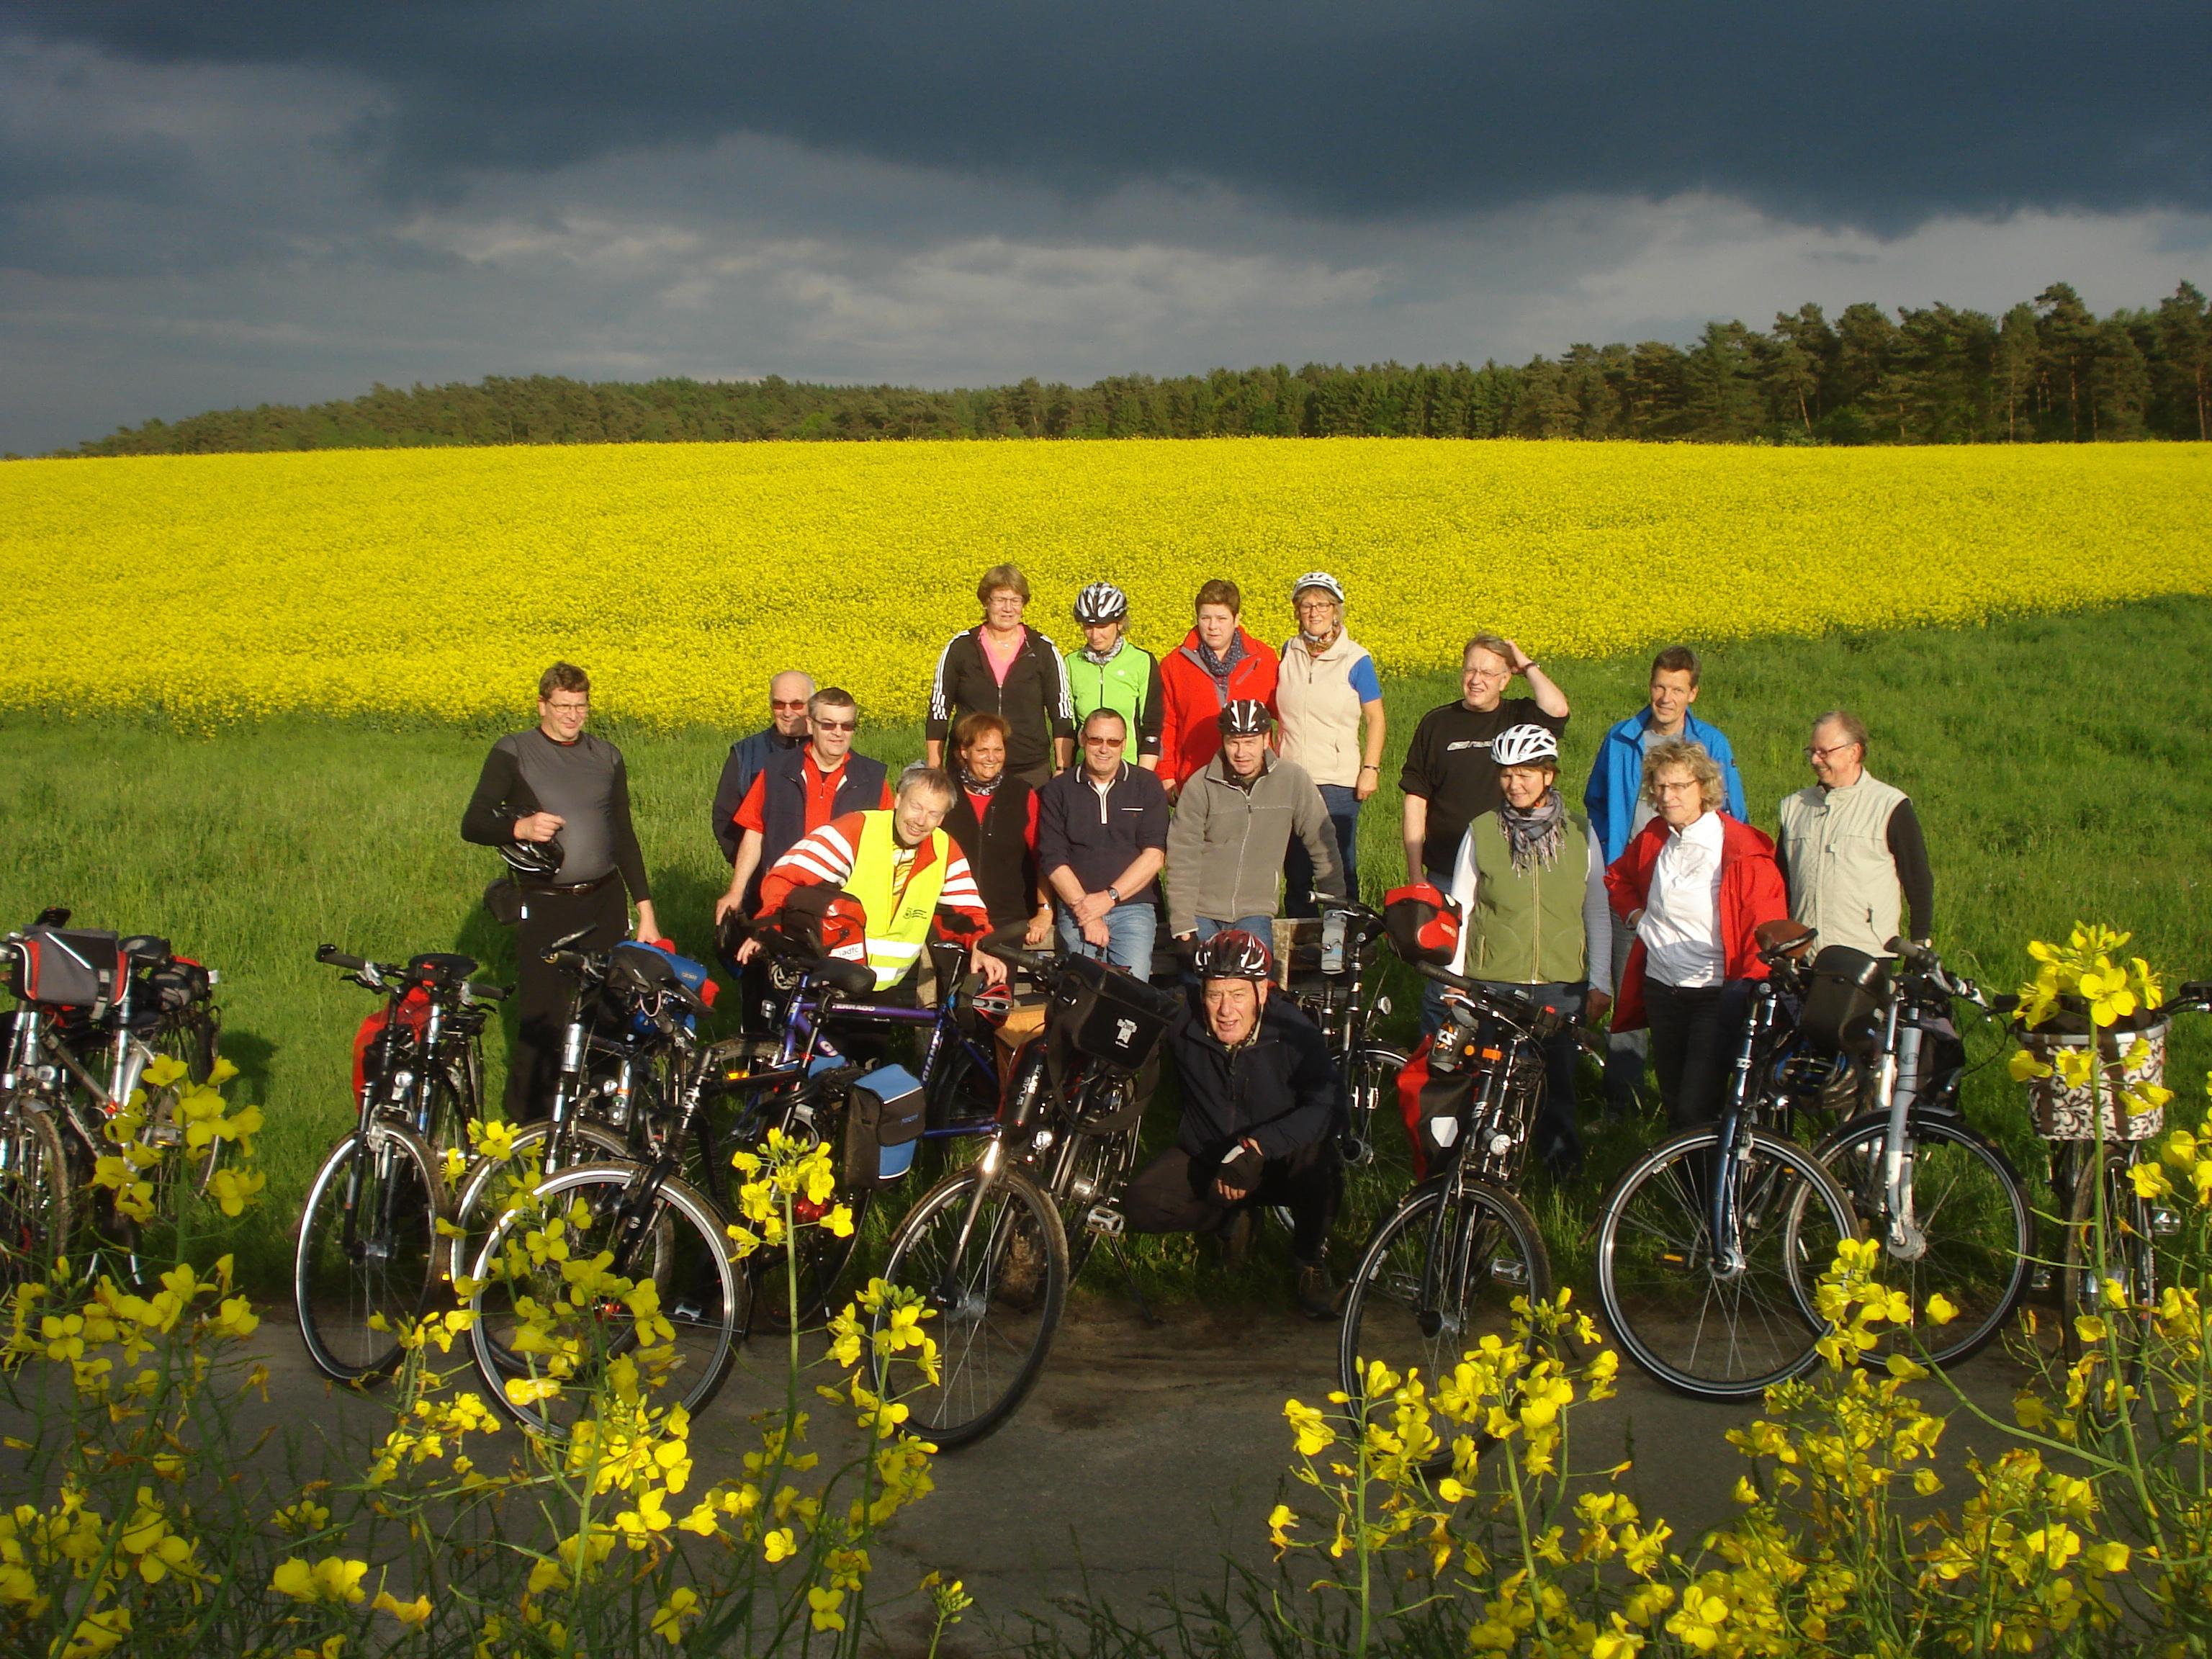 Fahrradgruppe vor einem Rapsfeld